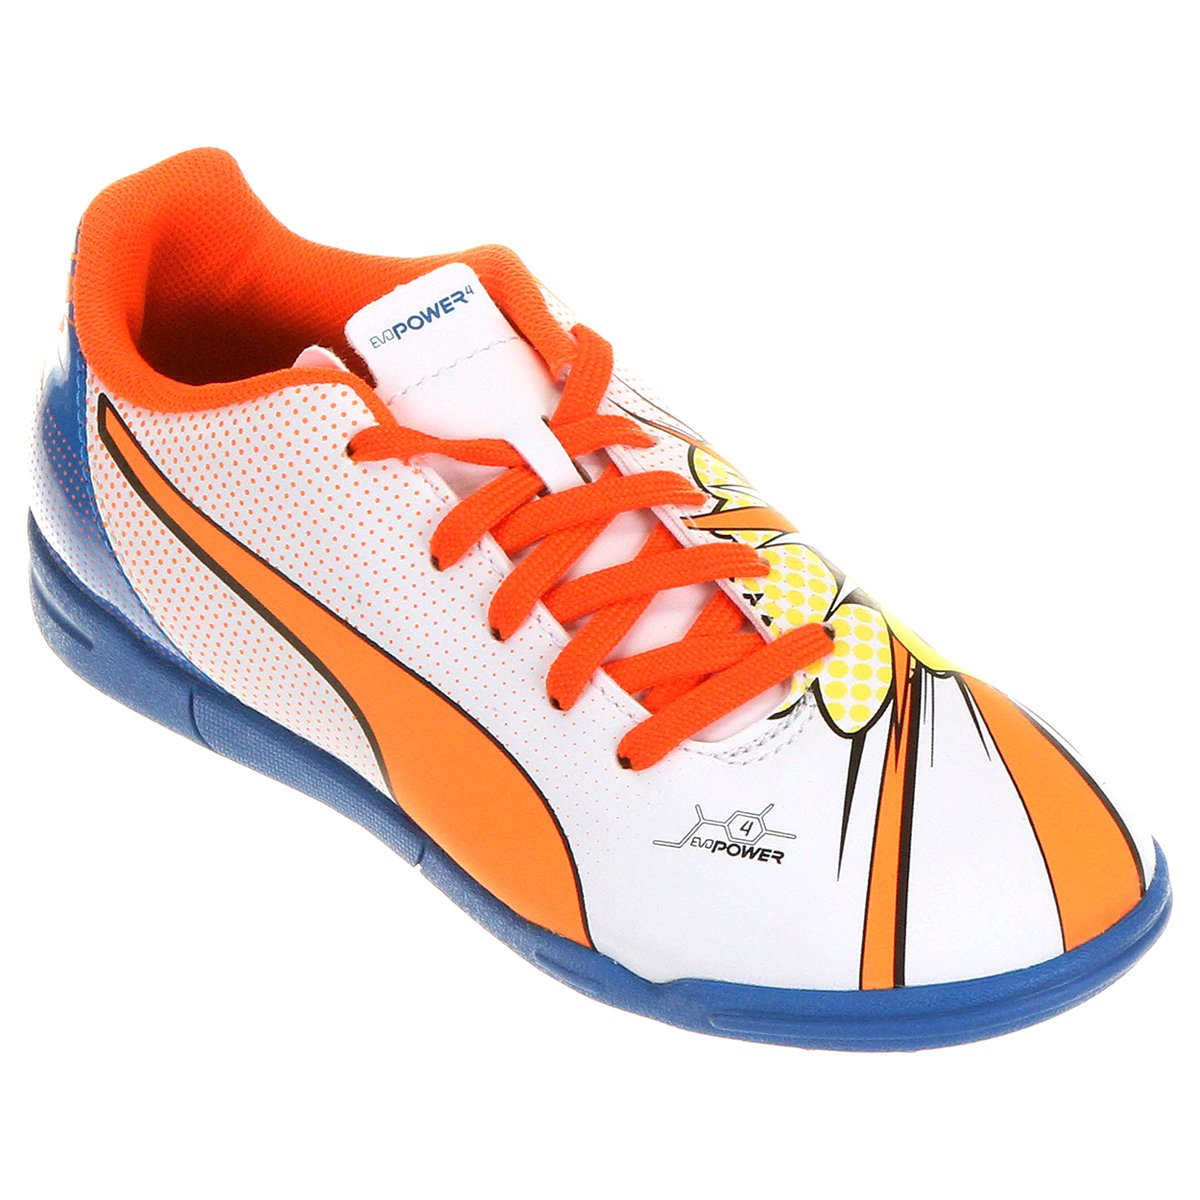 ... fashion styles Chuteira Puma Evopower 4.2 Pop TT Society Juvenil - Compre  Agora Netshoes df374 dce2a  latest discount Chuteira Puma Evopower Vigor 4  ... 02ac7df1b9821